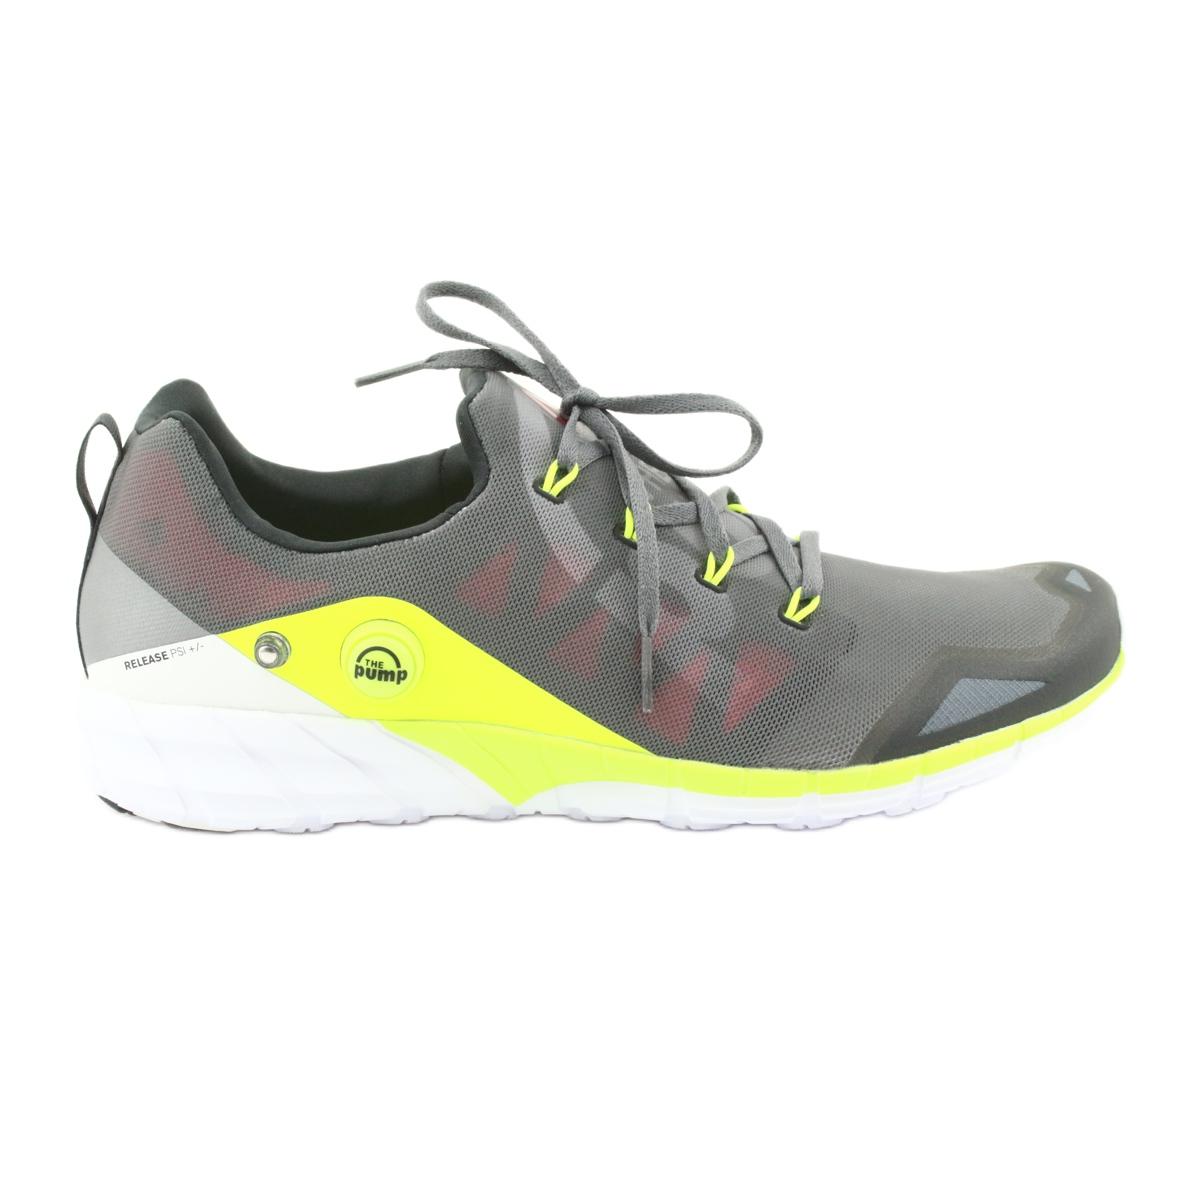 Details about Reebok ZPump Fusion 2.0 M V68290 training shoes